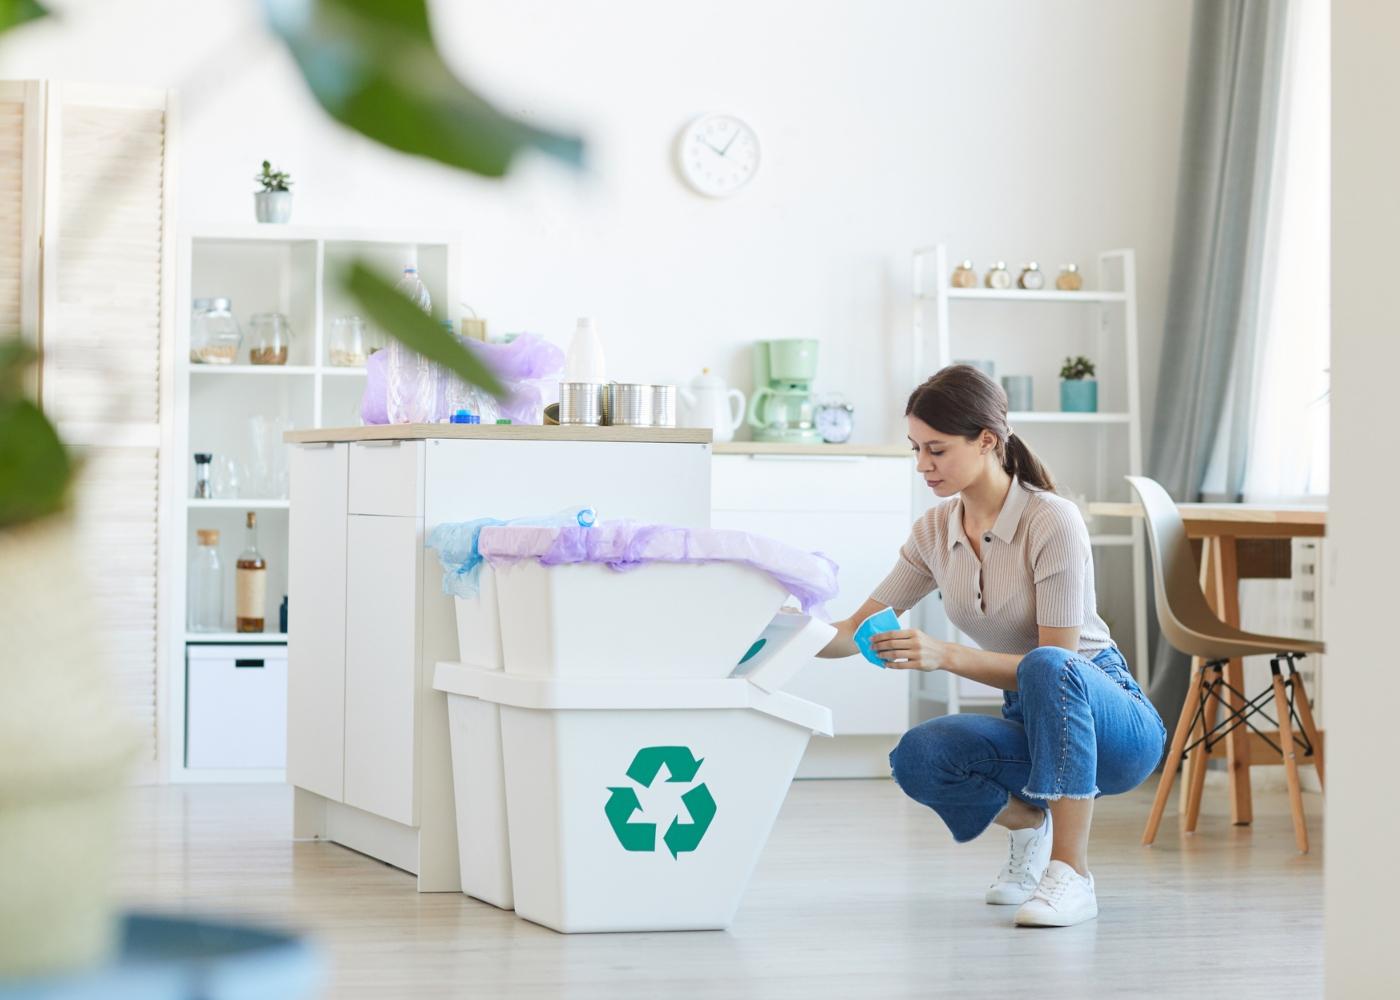 Mulher a separar resíduos domésticos